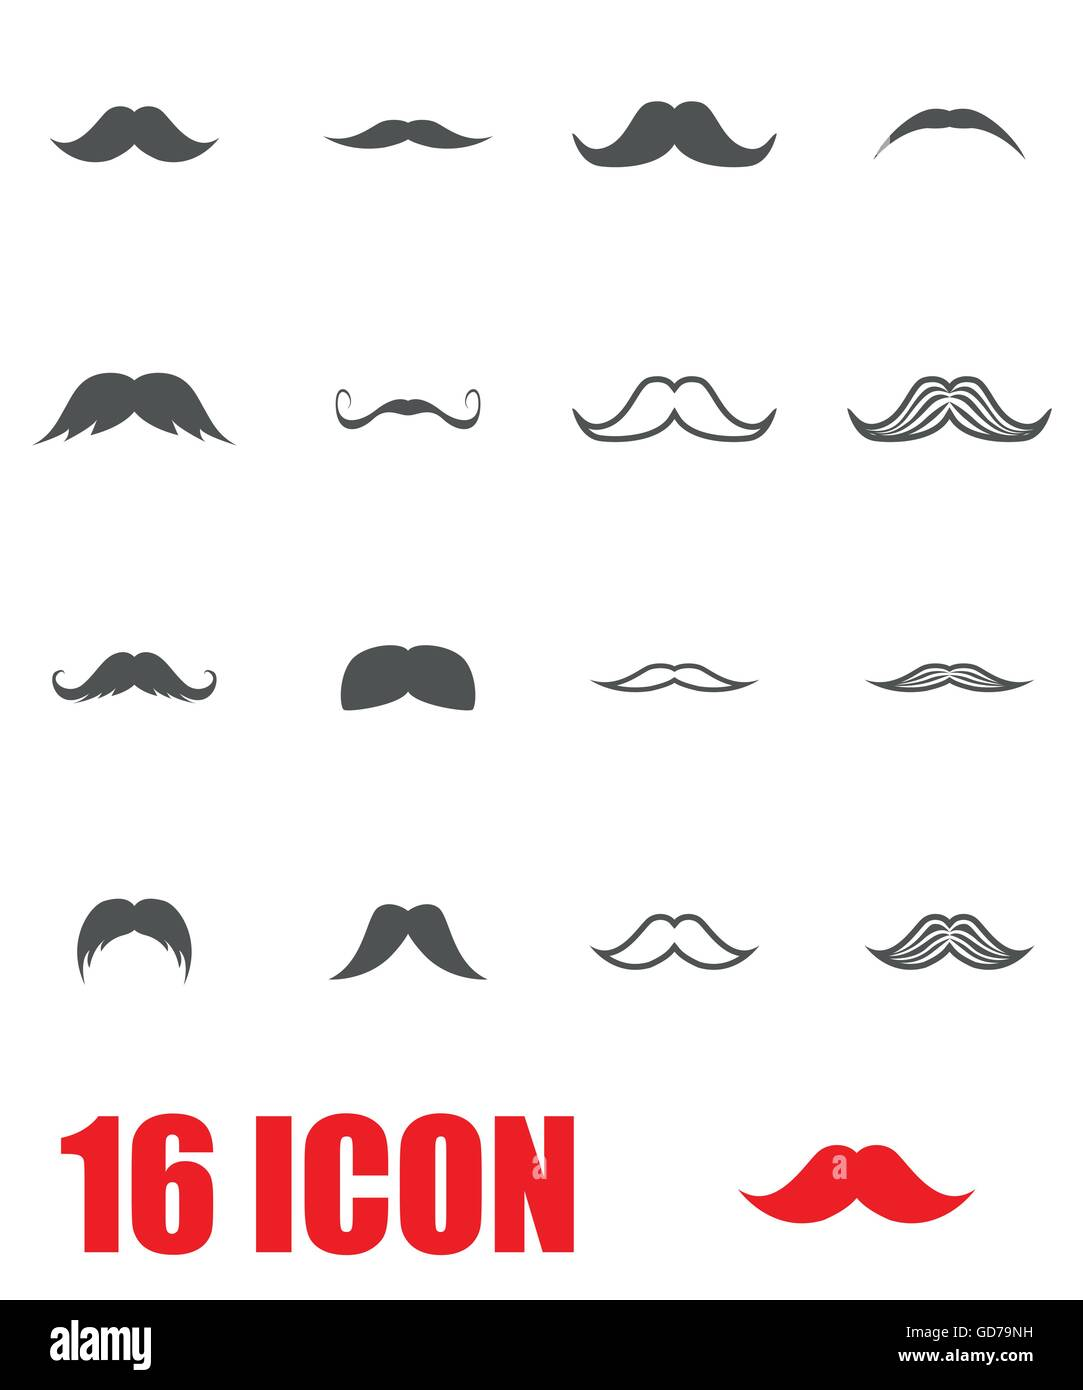 Vector grey moustaches icon set - Stock Image